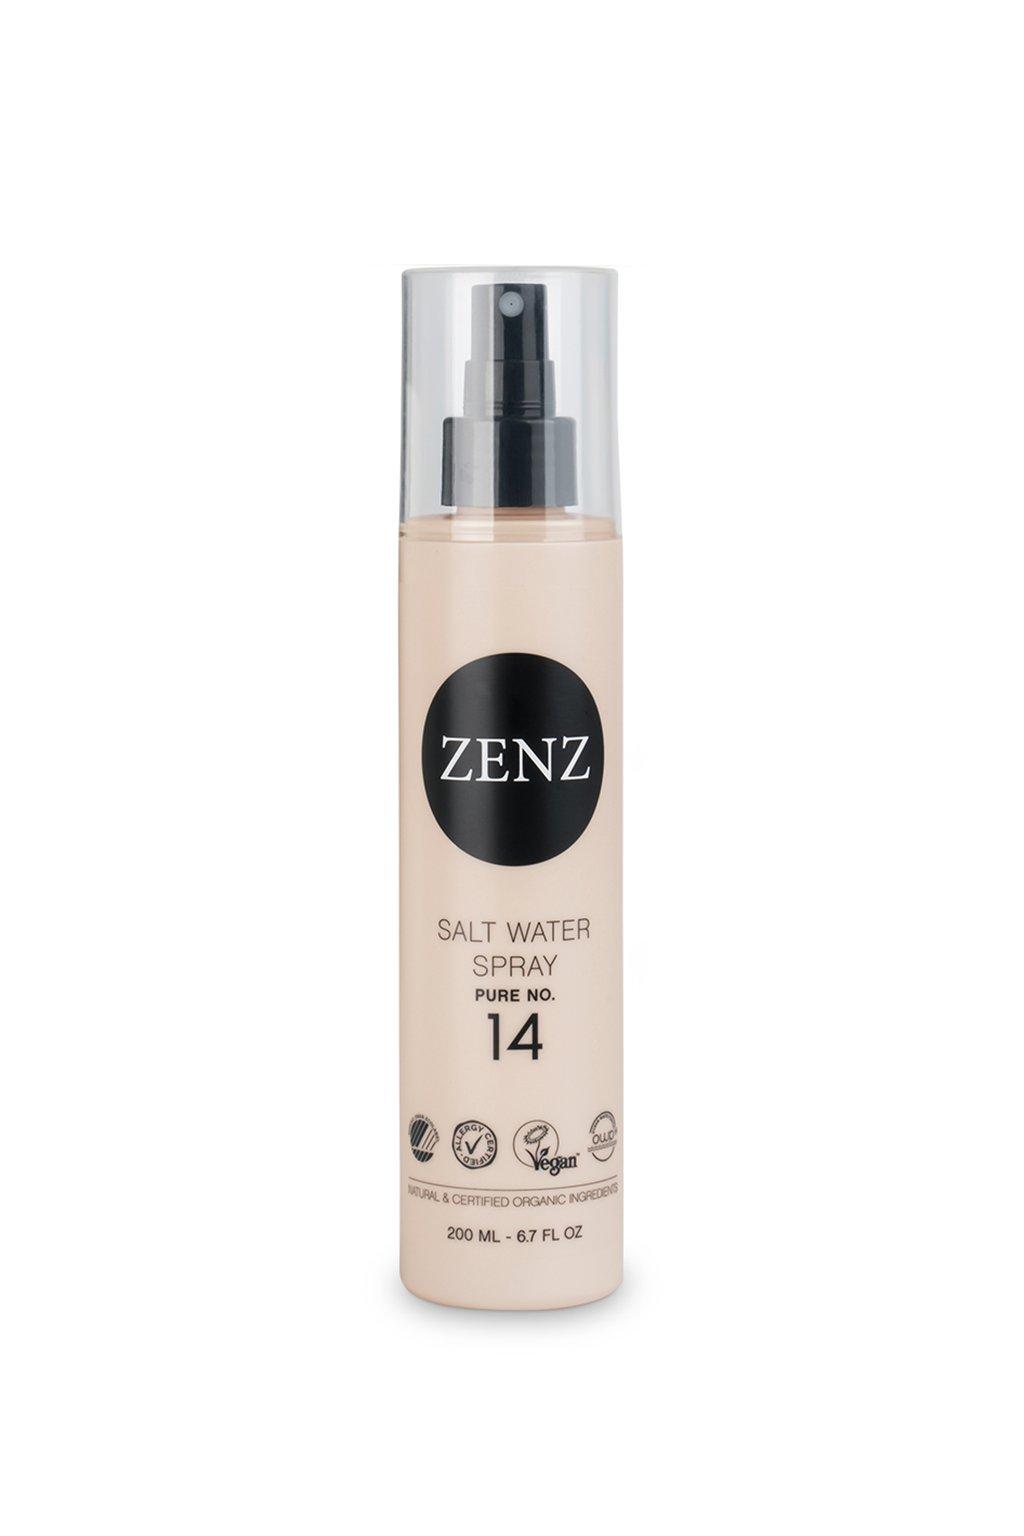 zenz pure salt water spray 14